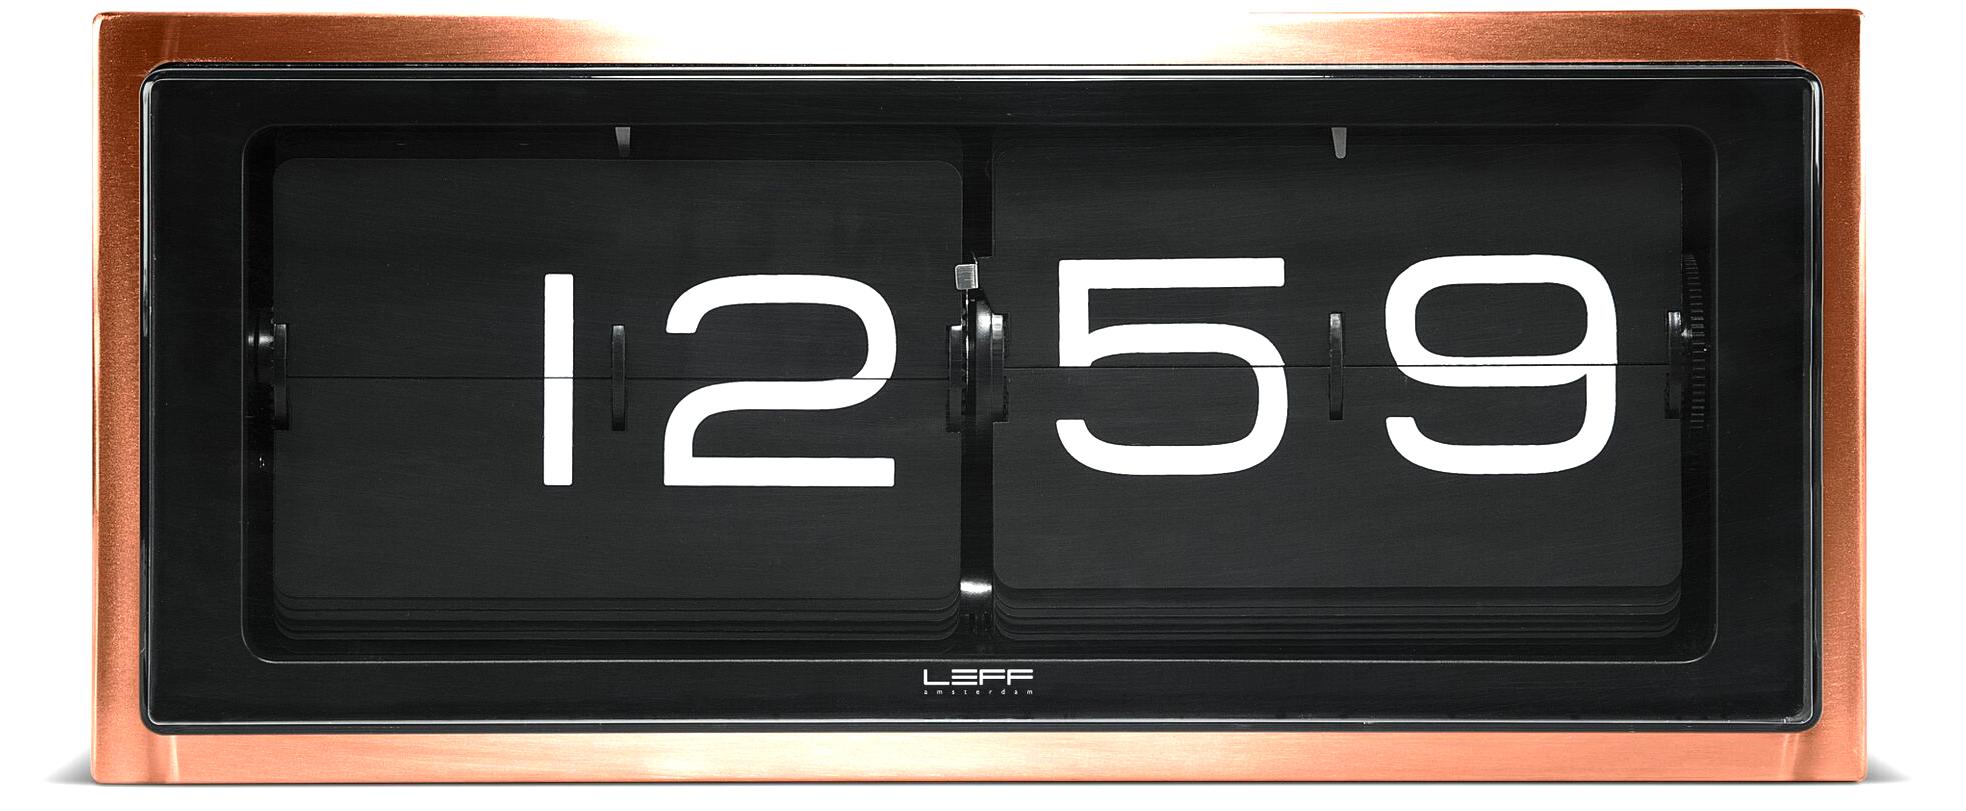 wanduhr tischuhr leff amsterdam brick24 lt15301 g nstig. Black Bedroom Furniture Sets. Home Design Ideas